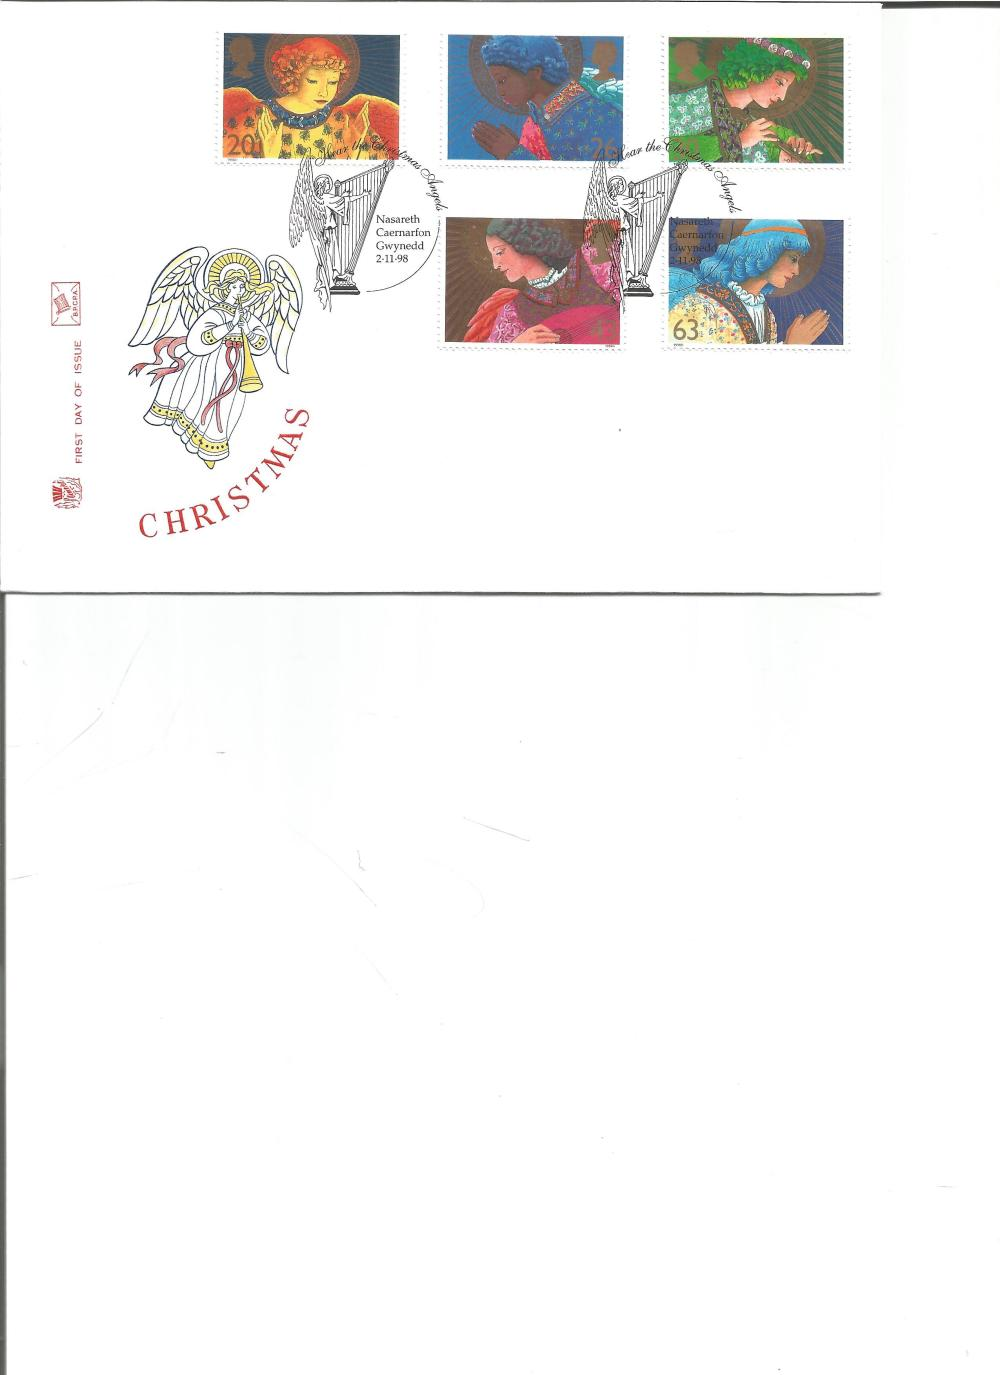 FDC Christmas c/w set of five stamps , double PM Hear the Christmas Angels, Nasareth, Caernarfon,